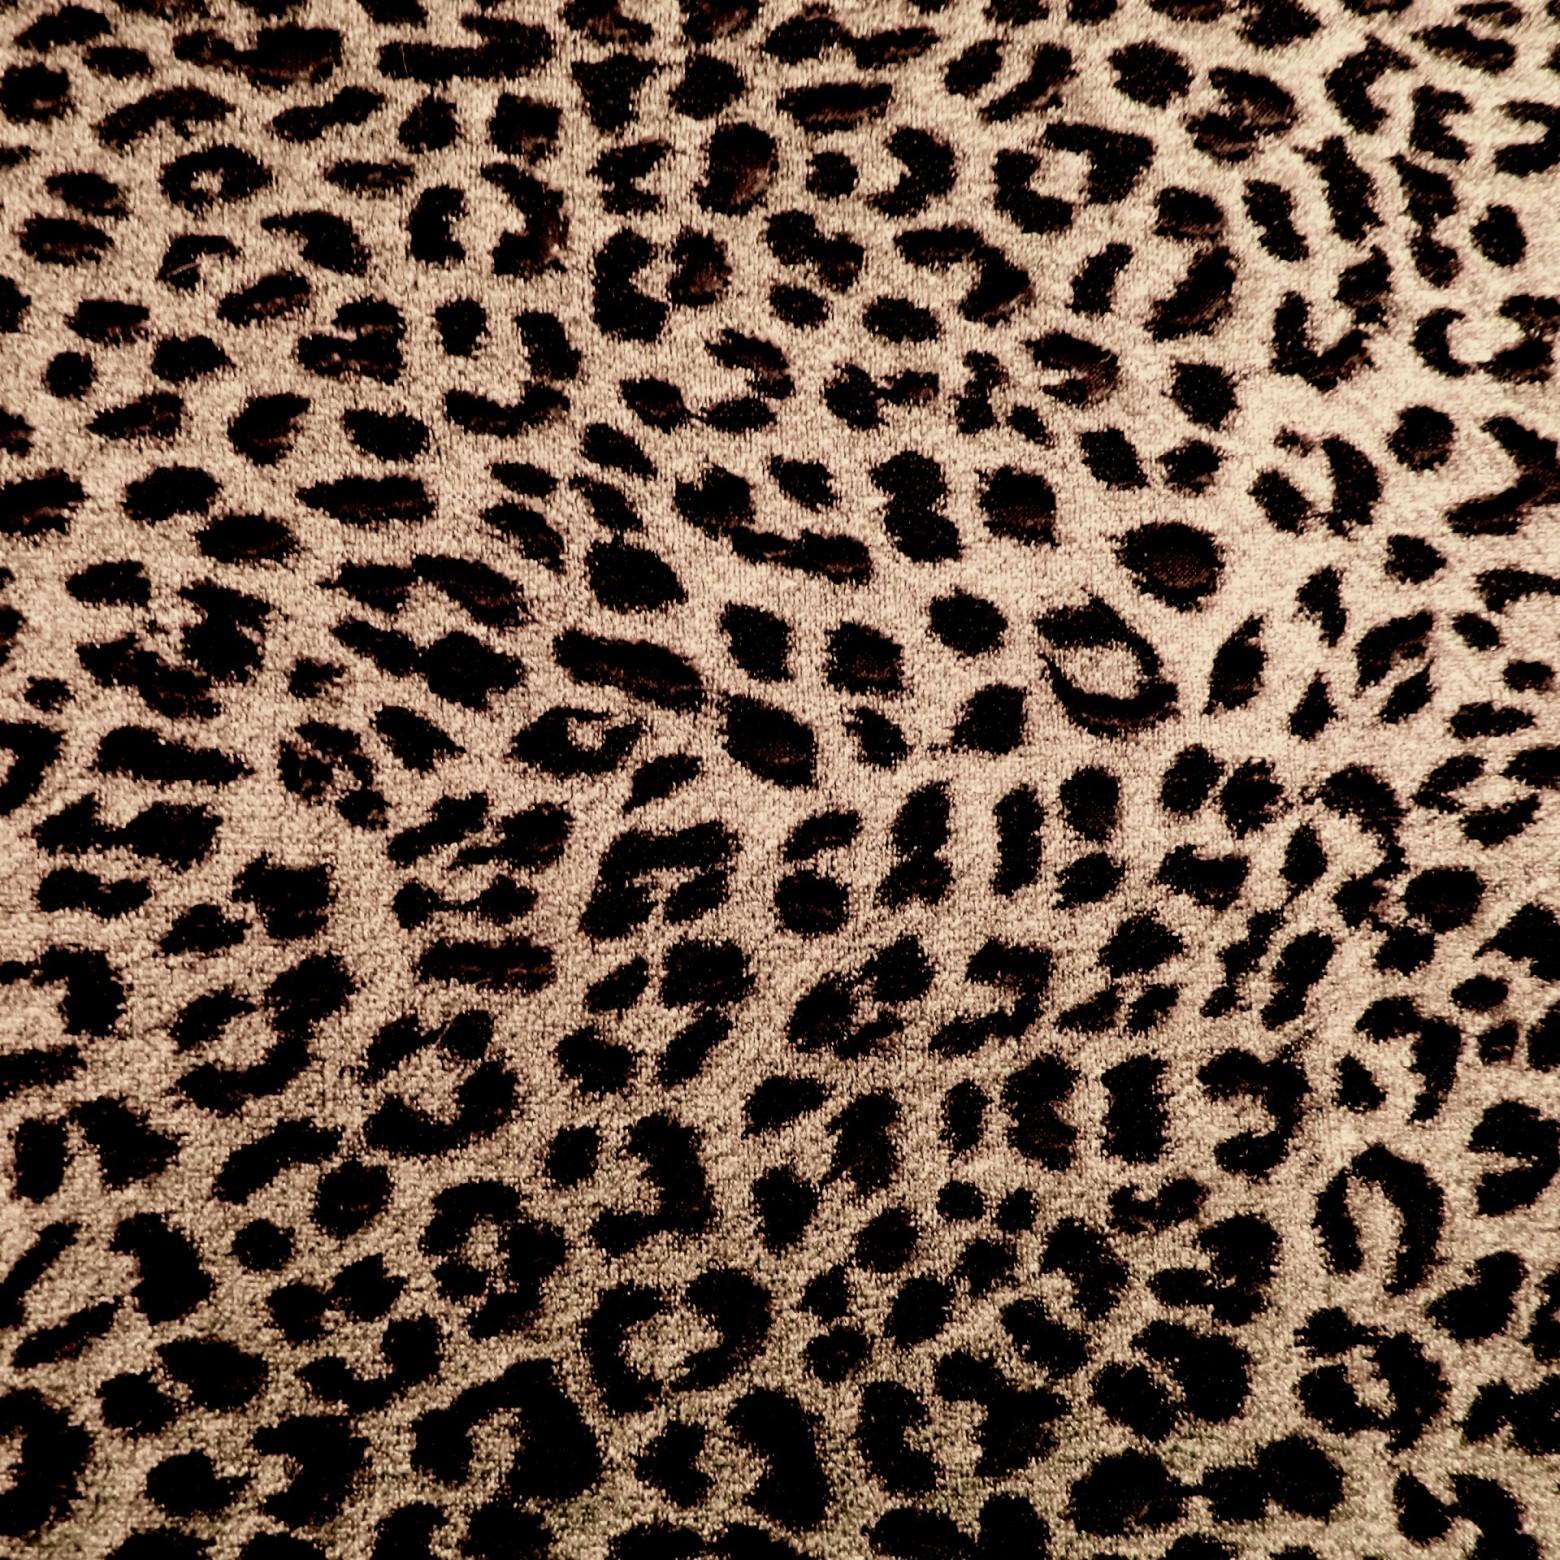 texture l opard motif images gratuites et libres de droits. Black Bedroom Furniture Sets. Home Design Ideas